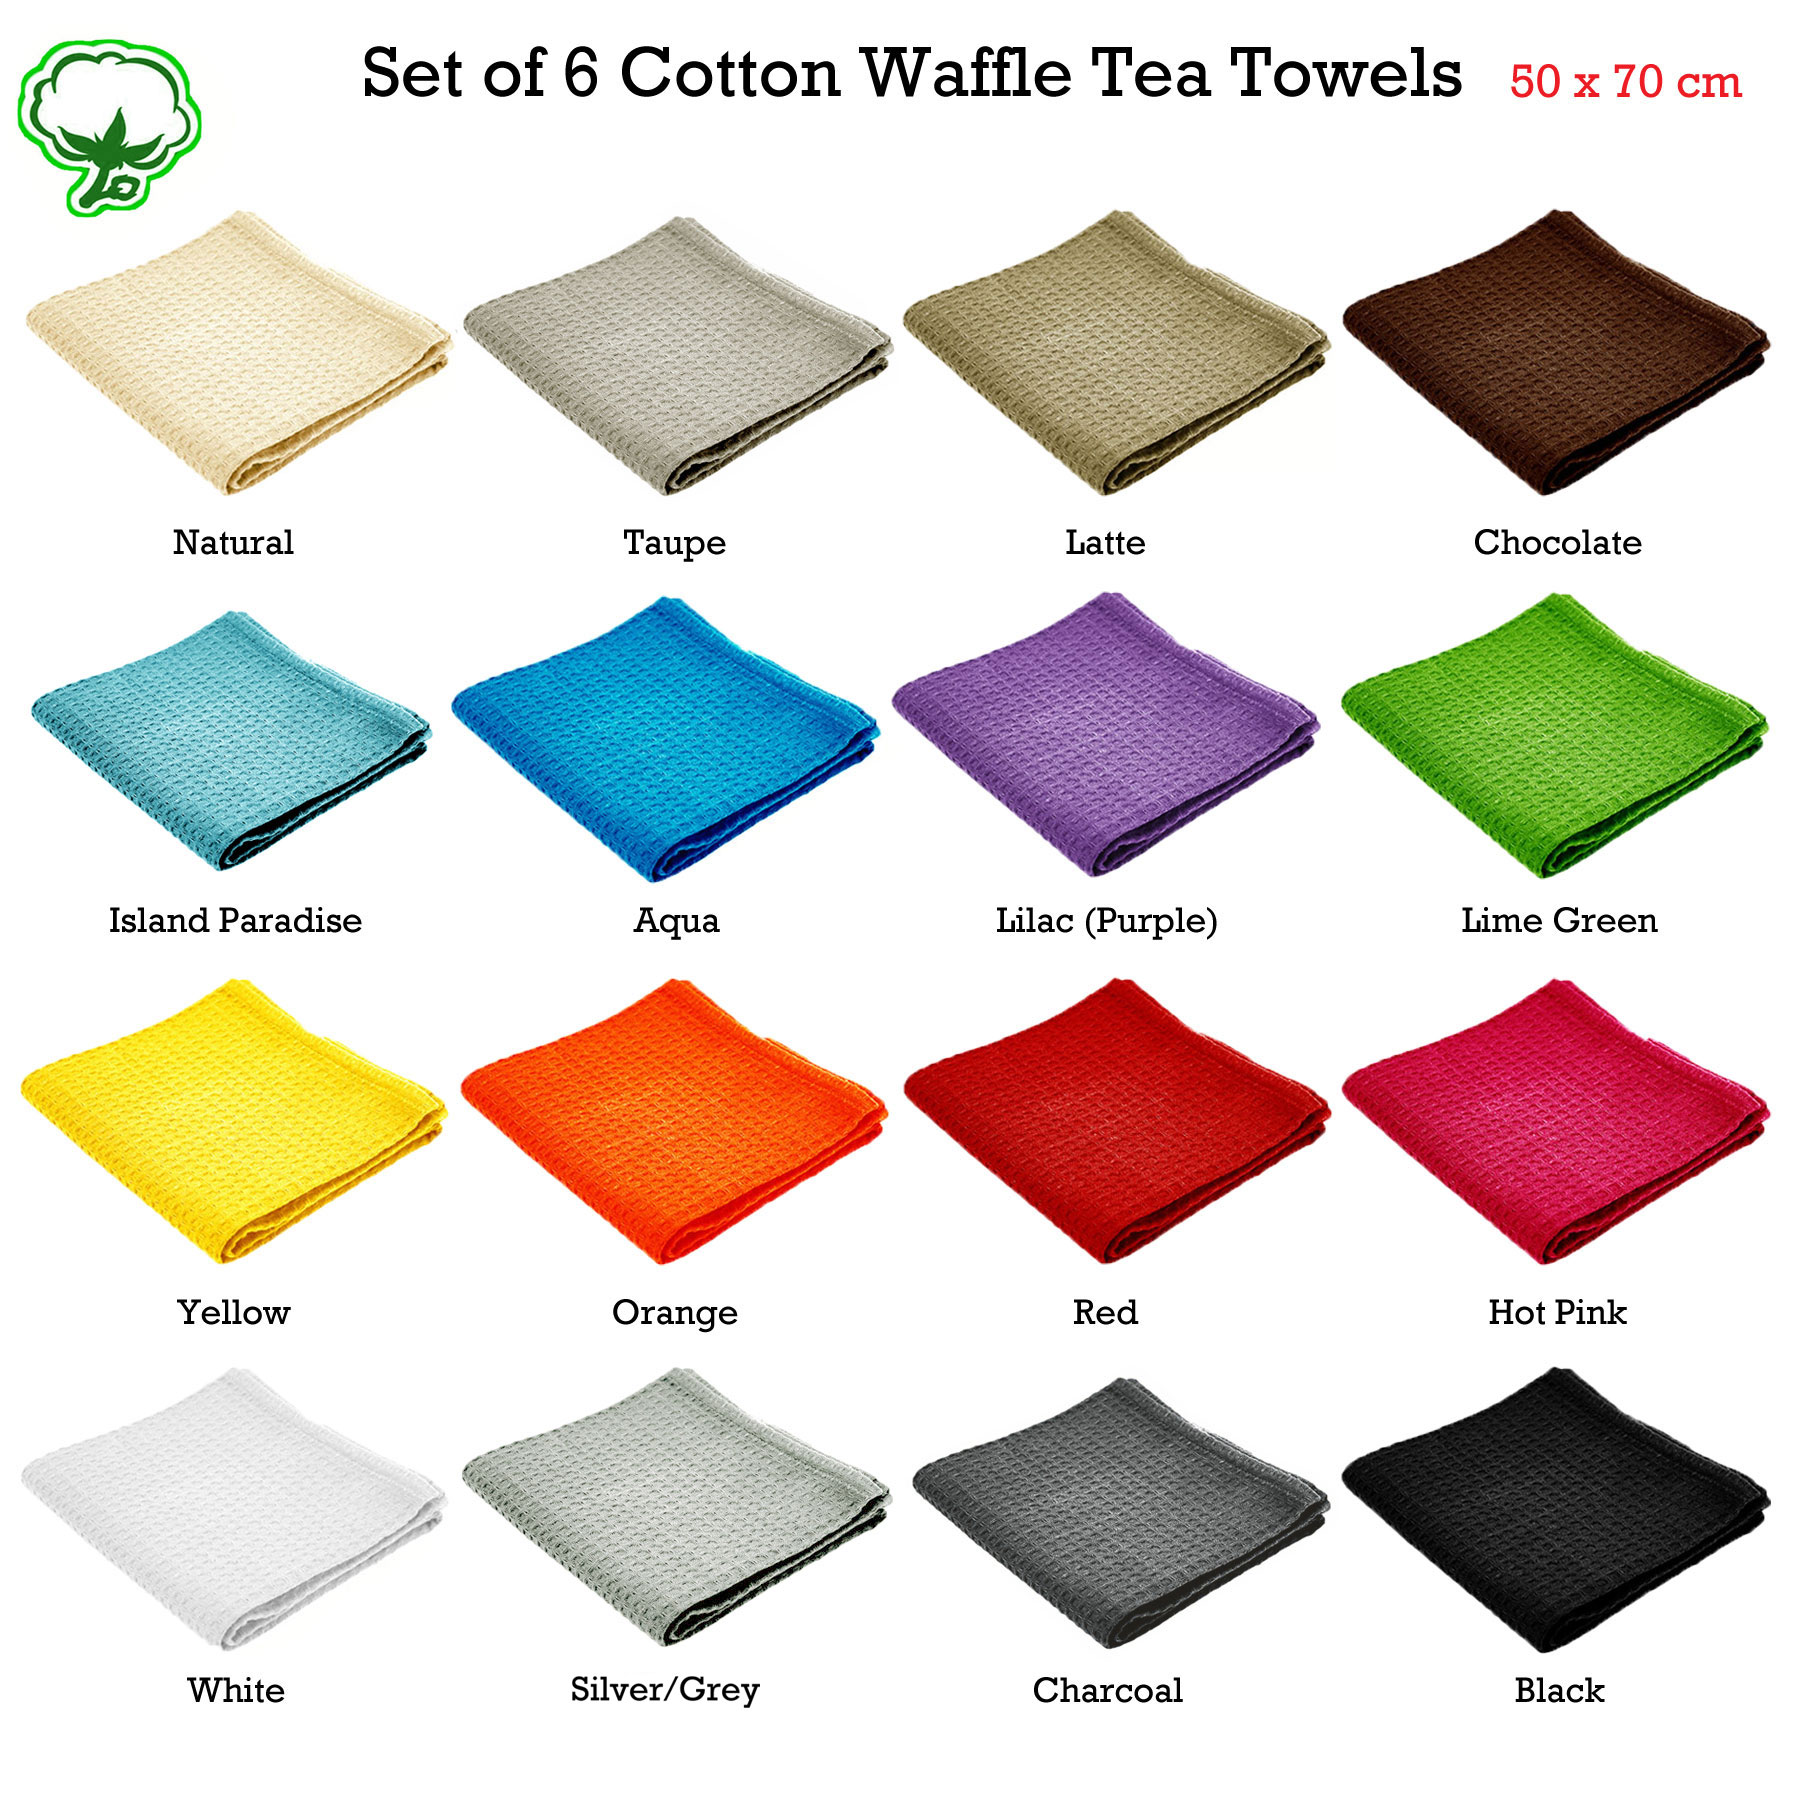 Set of 6 100% Cotton London WAFFLE Pattern Tea Towels 50 x 70cm - 13 ...